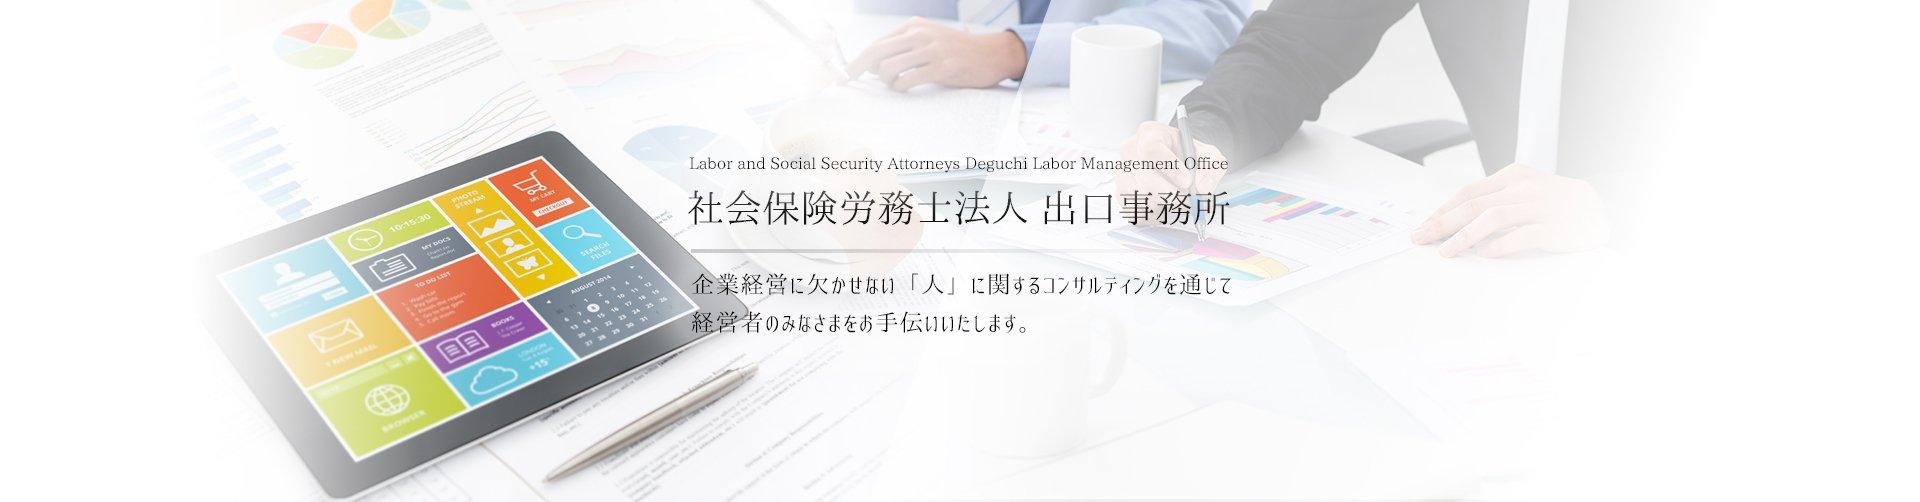 deguchi_top2_1028.jpg